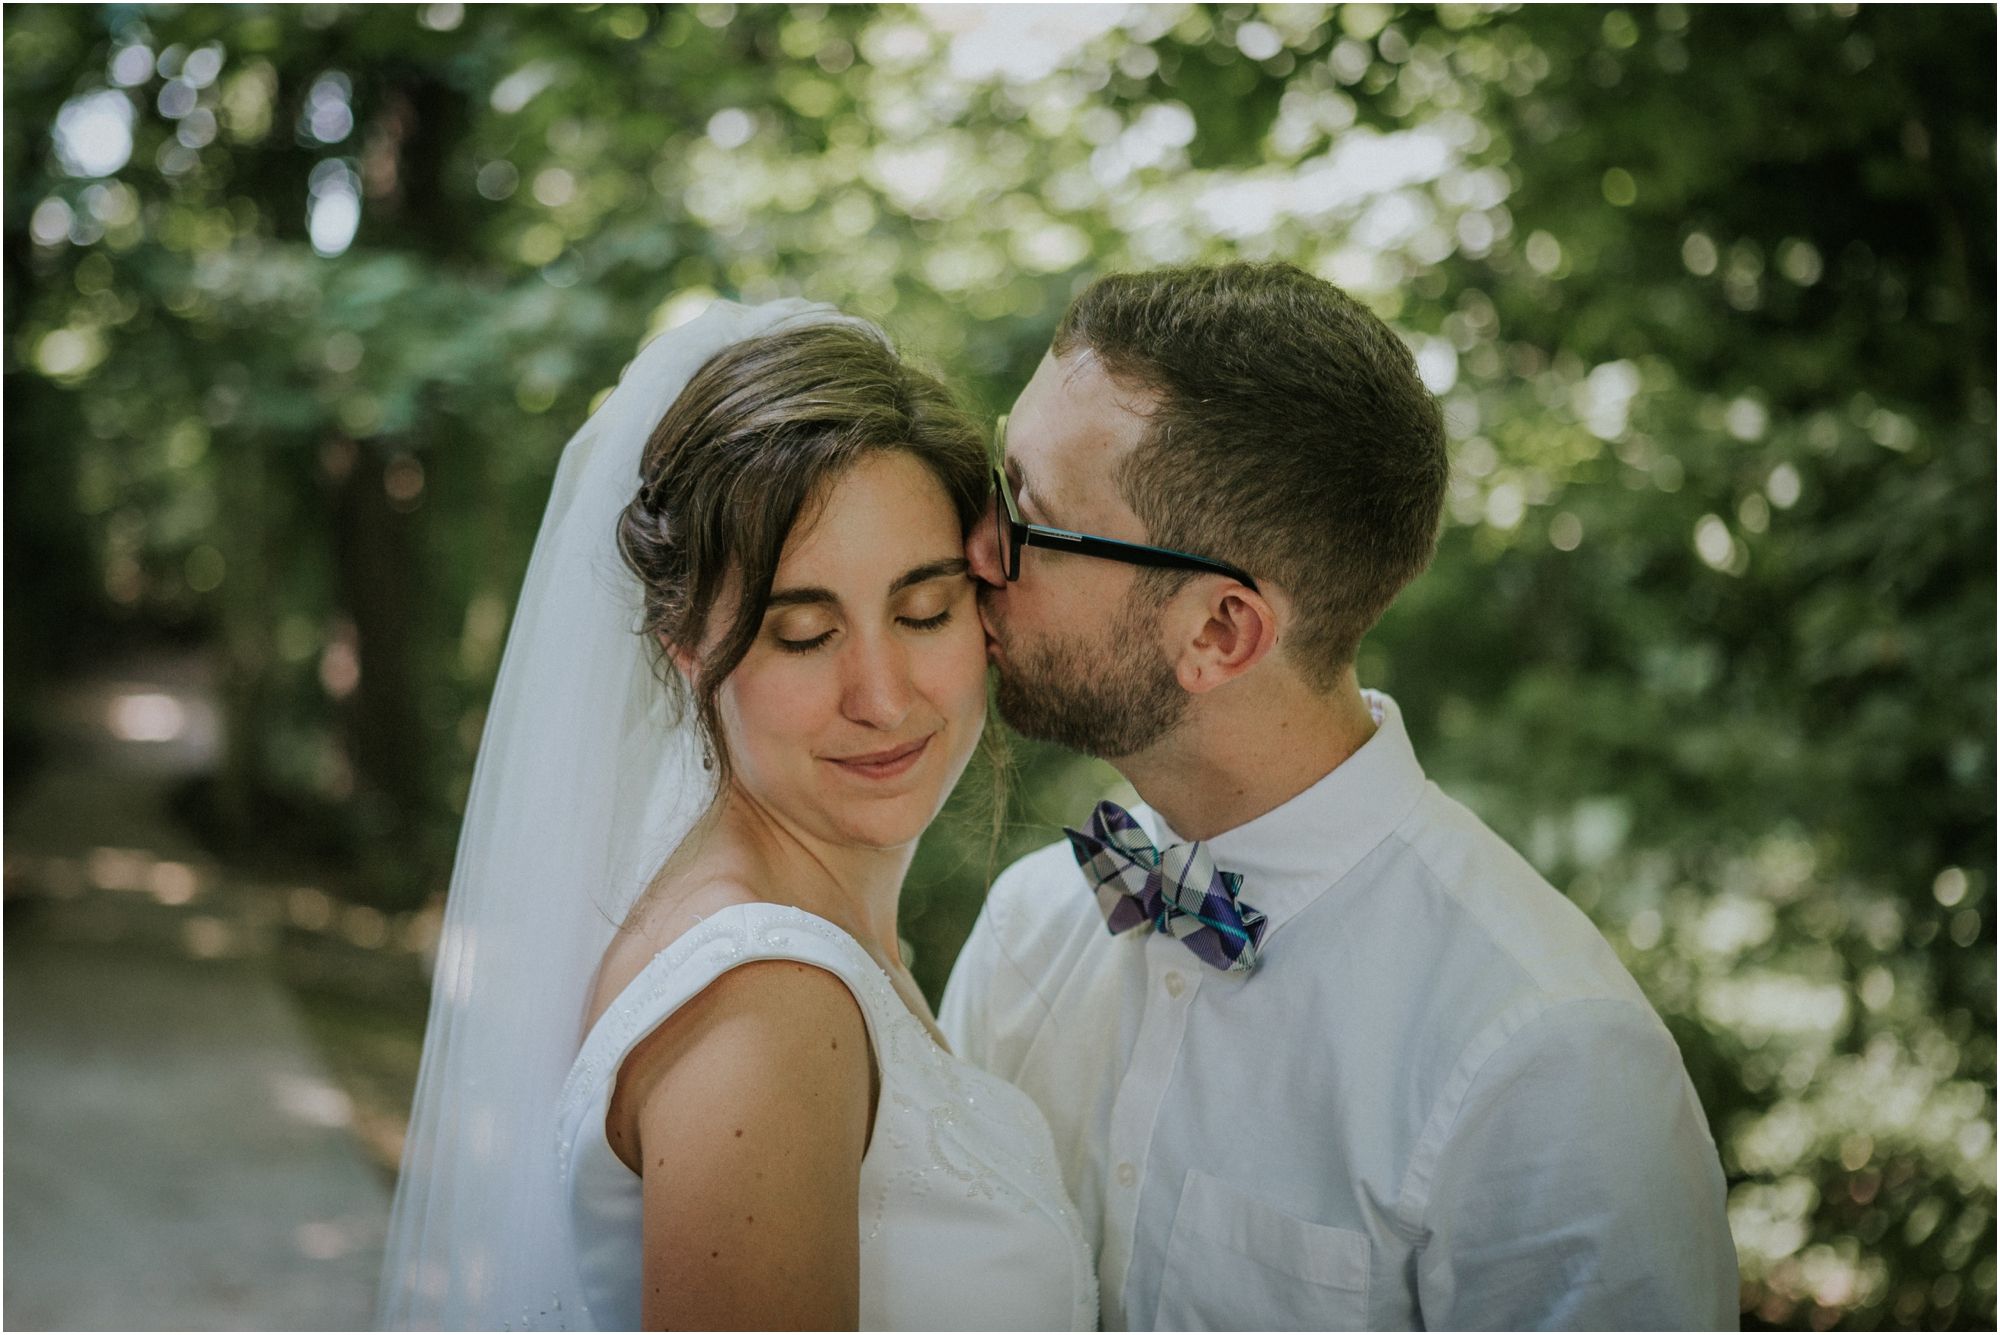 sugar-hollow-park-bristol-virginia-wedding-intimate-woodsy-black-forest-ceremony-adventurous-couple_0062.jpg